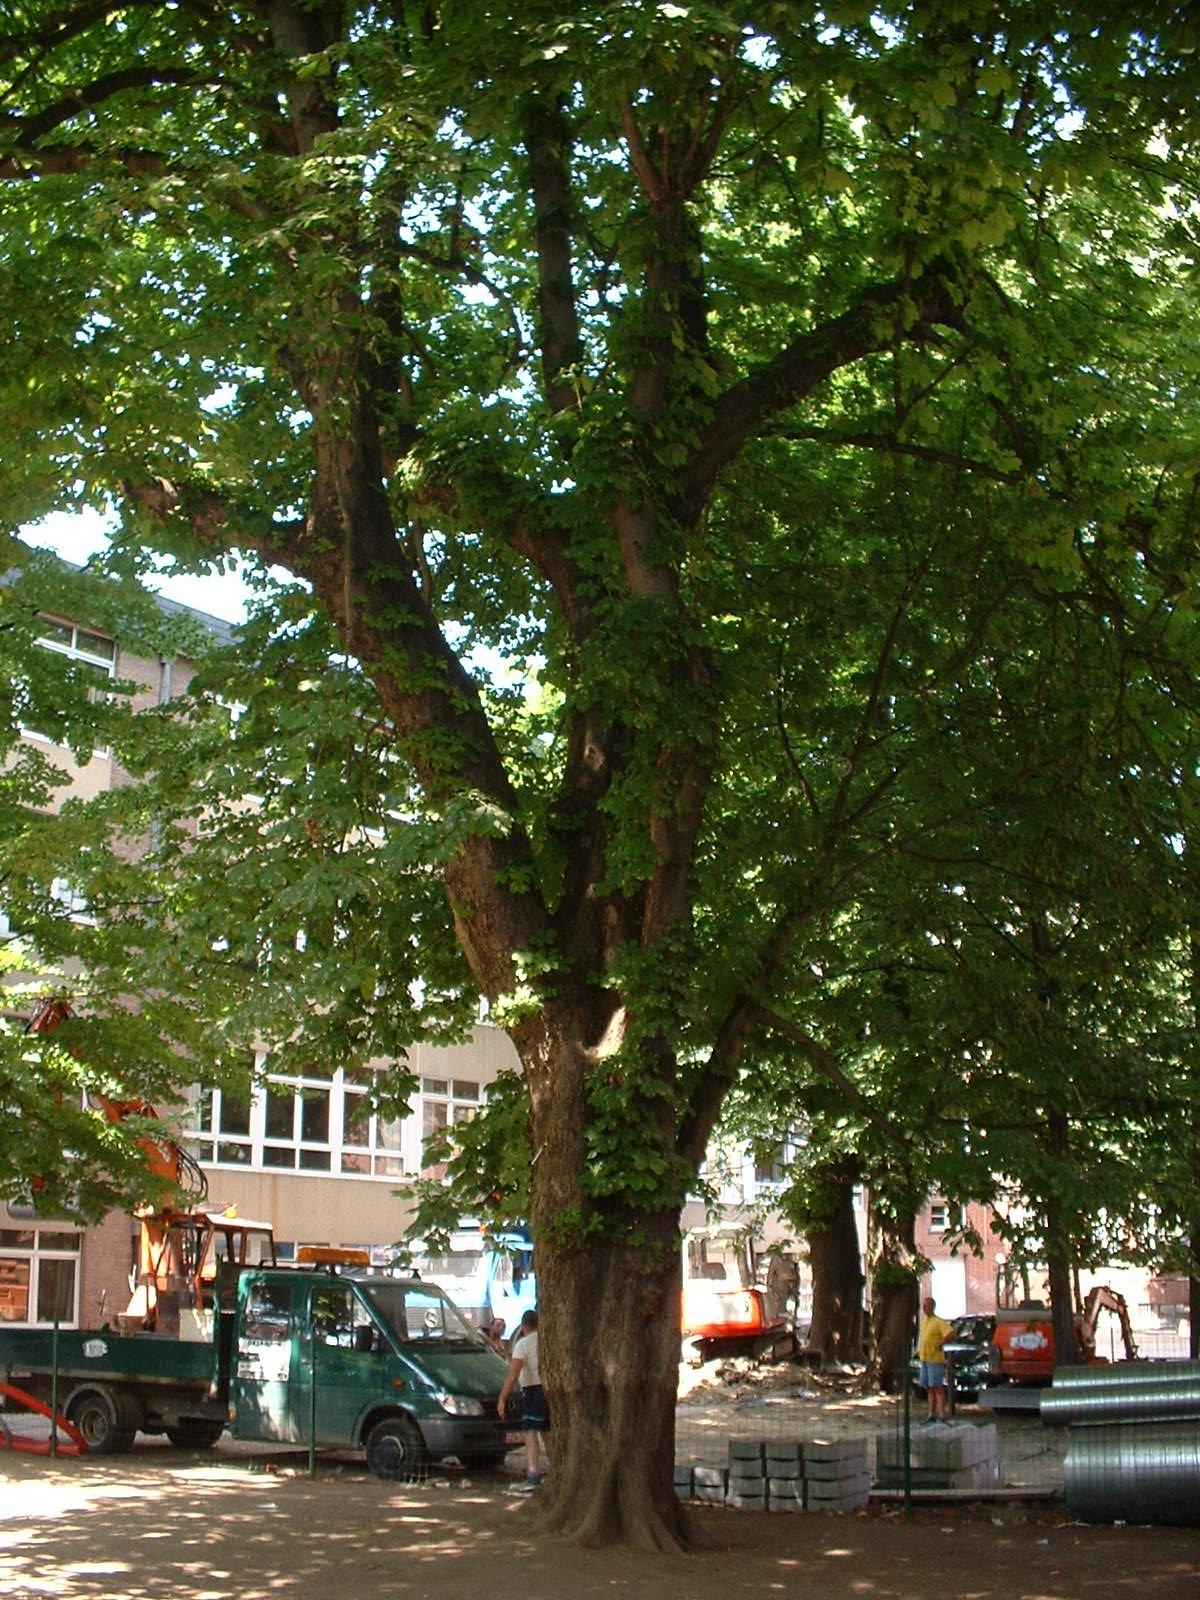 Marronnier commun – Ixelles, Rue Africaine, 3 –  13 Juin 2003